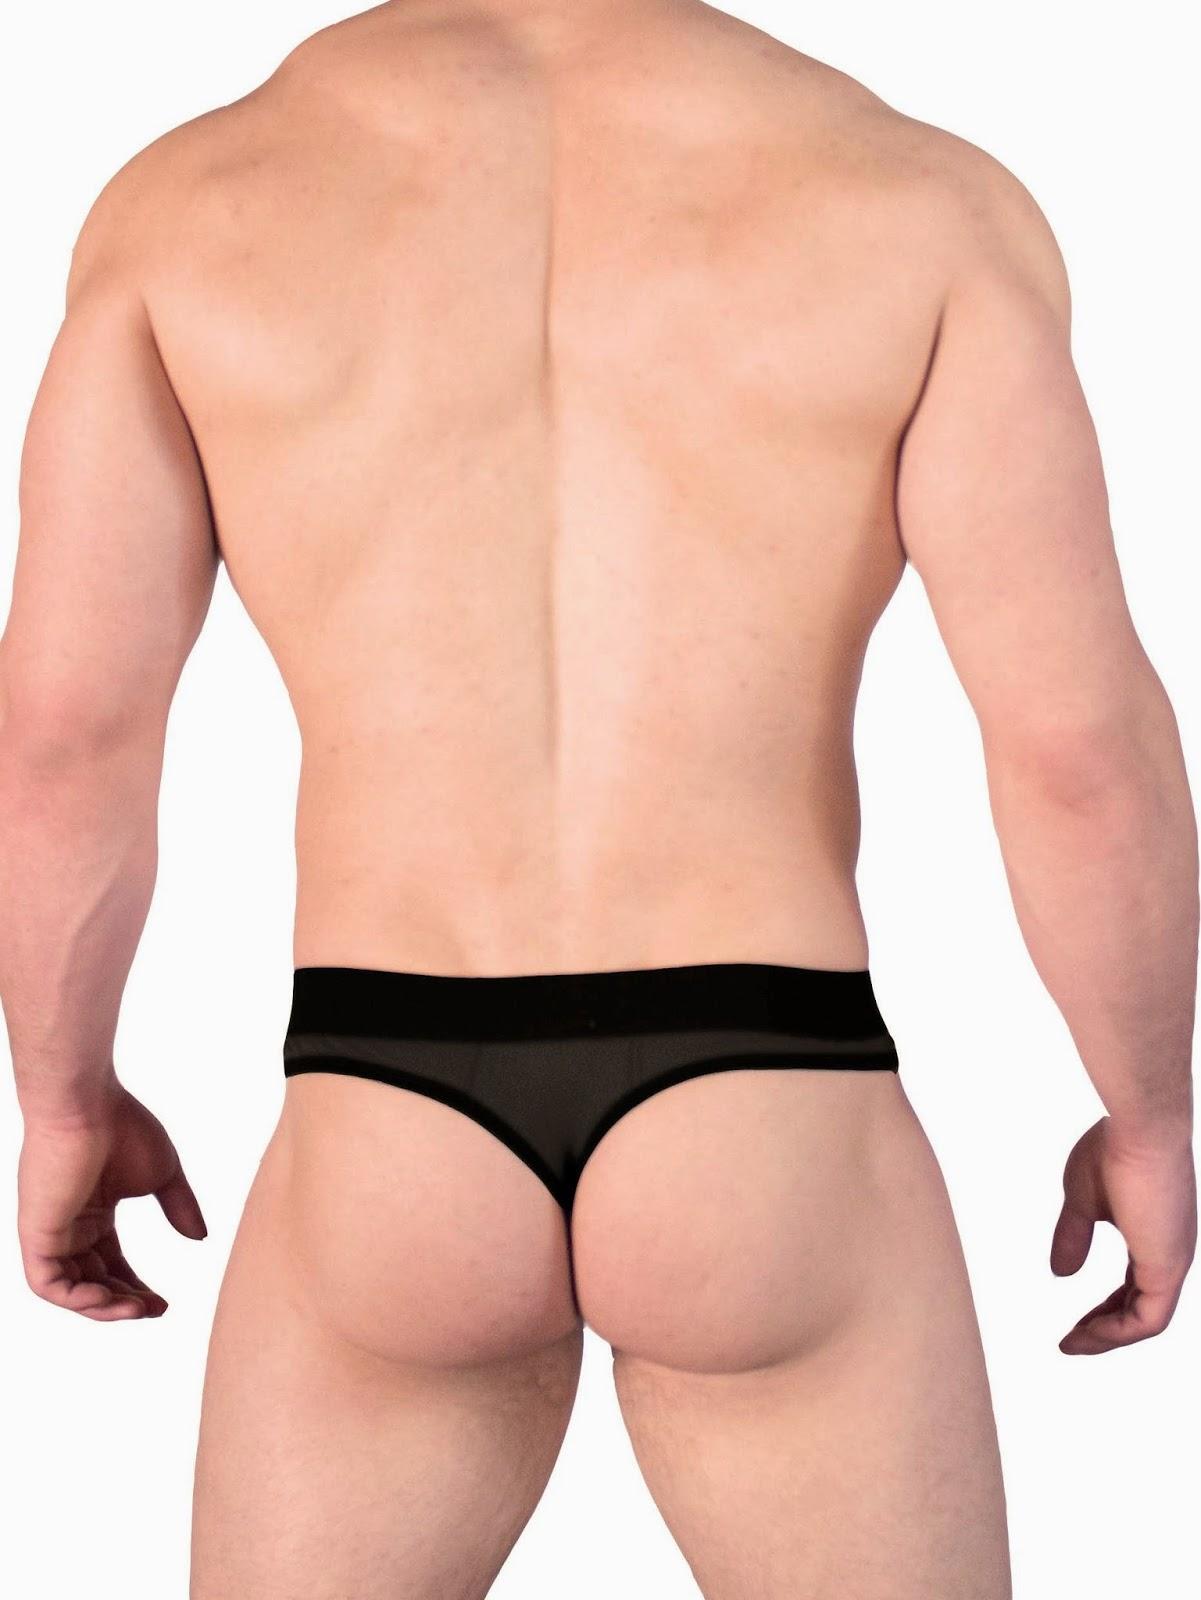 GBGB Wear Marius Thong Underwear See-Thru Pouch Solid Black